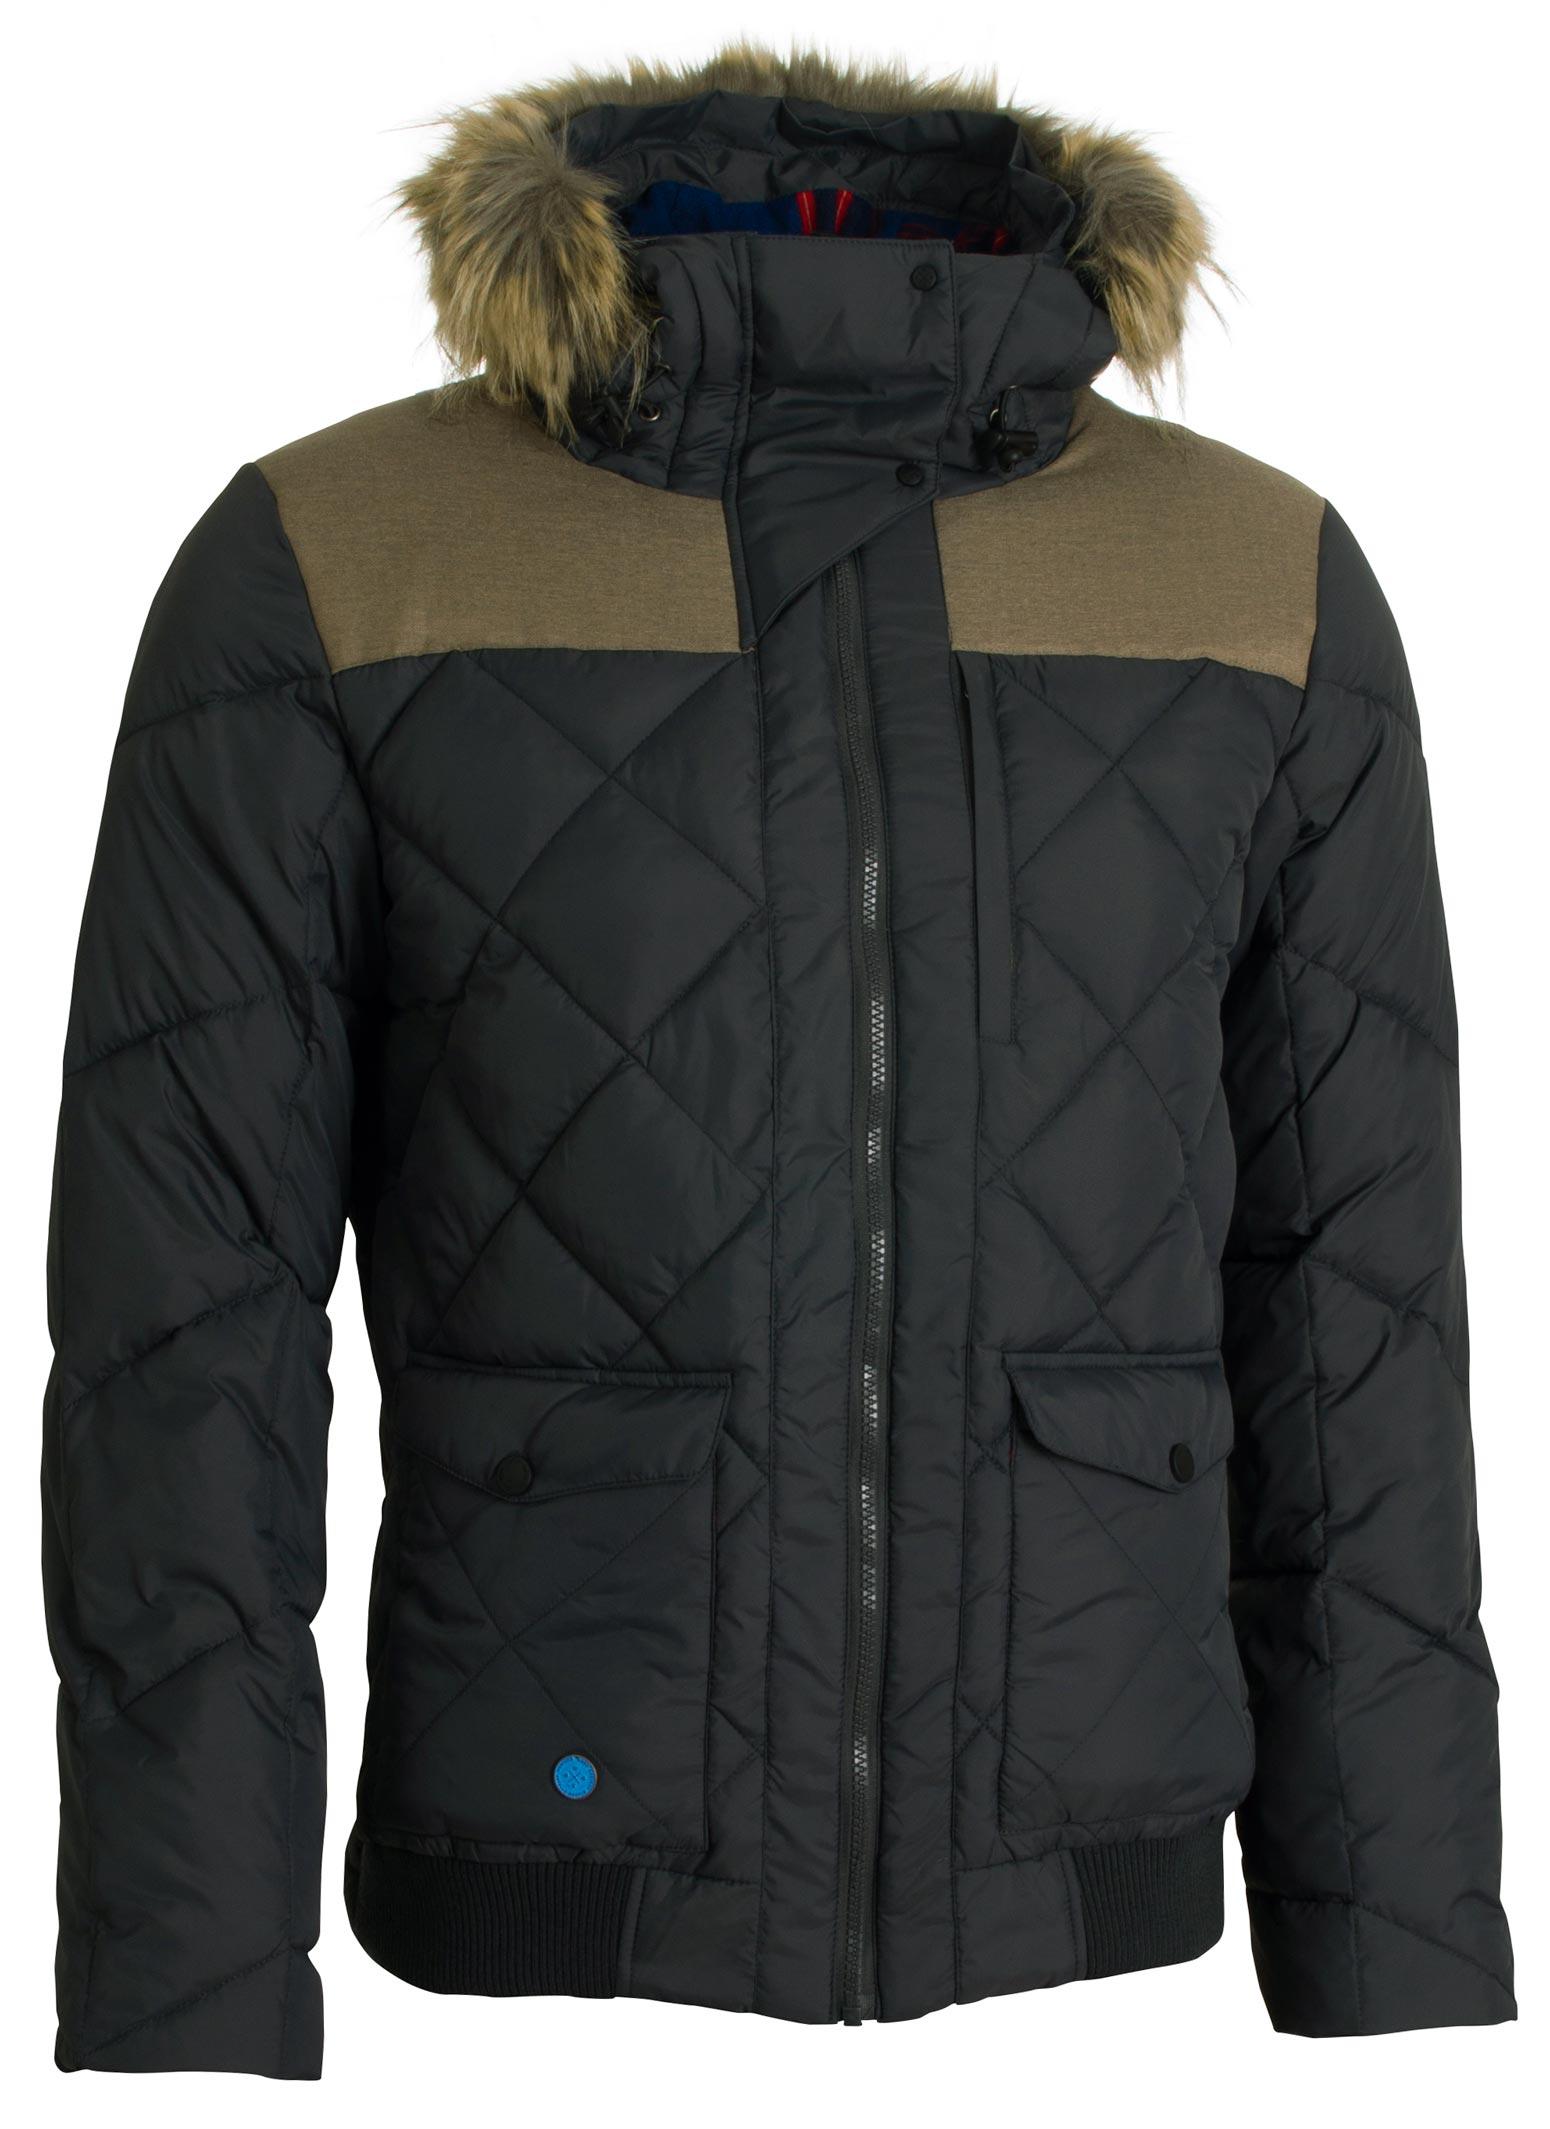 Zimní bunda pánská WOOX Wintershell Men's Jacket